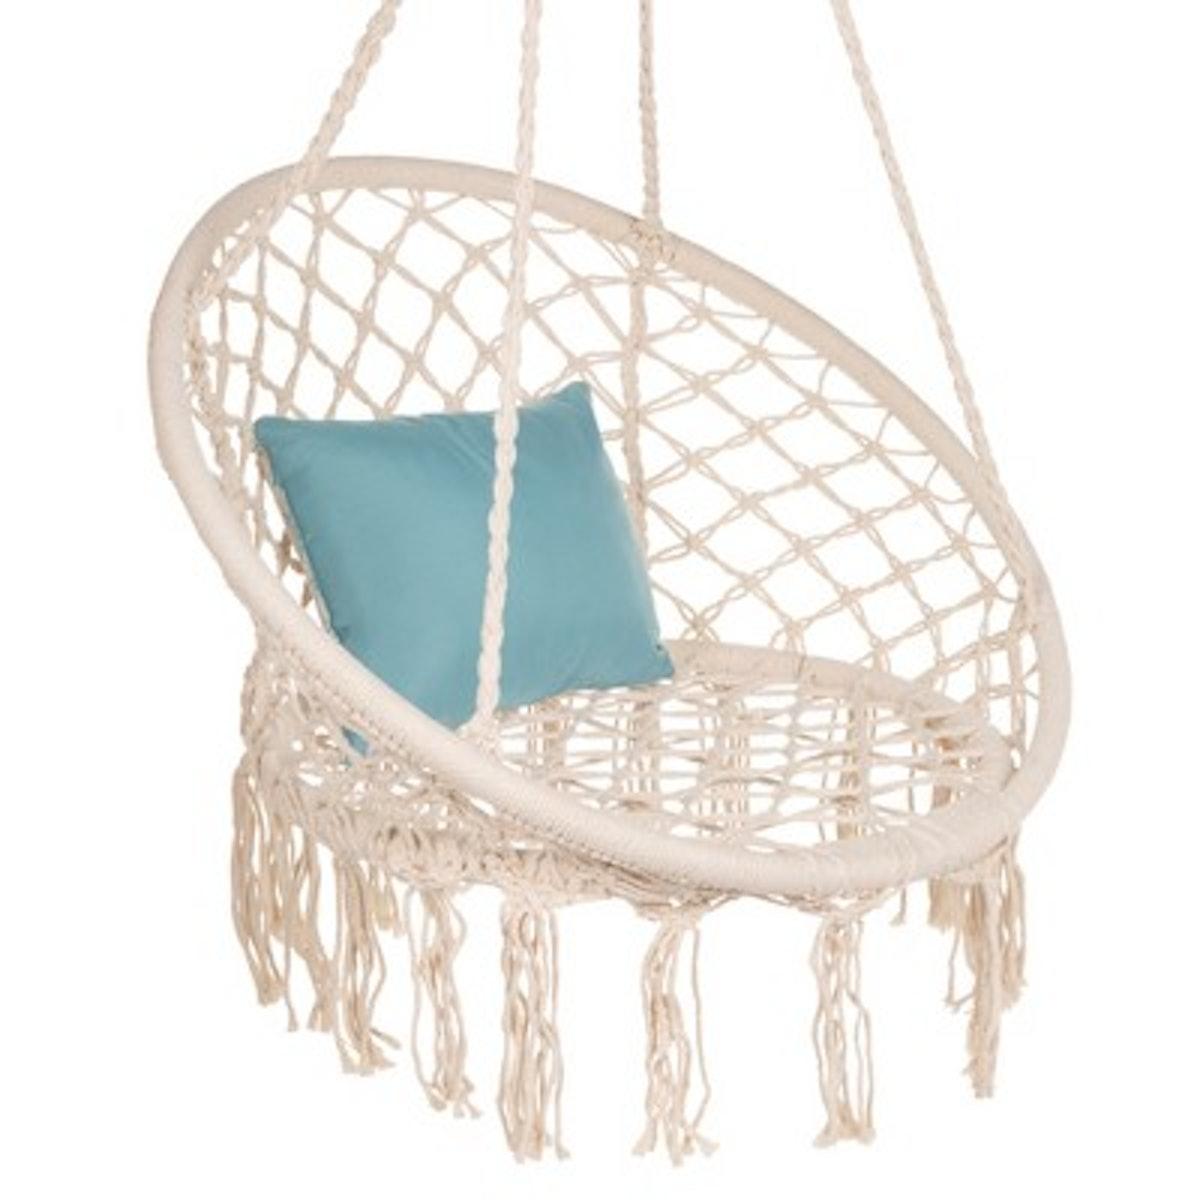 Macramé Hammock Hanging Chair Swing